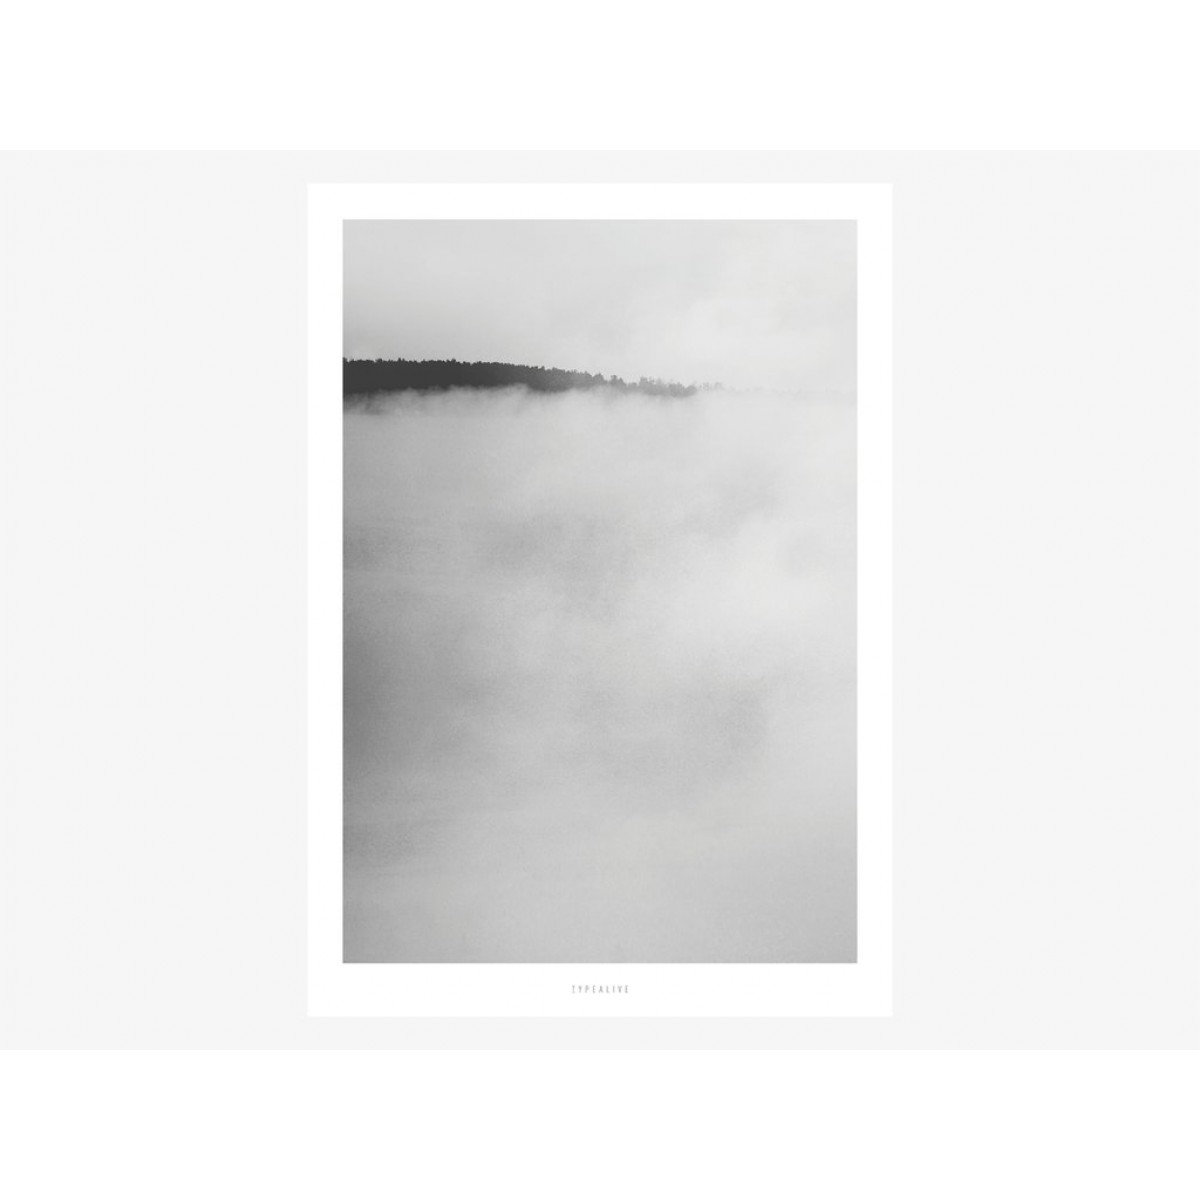 typealive / Landscape No. 34